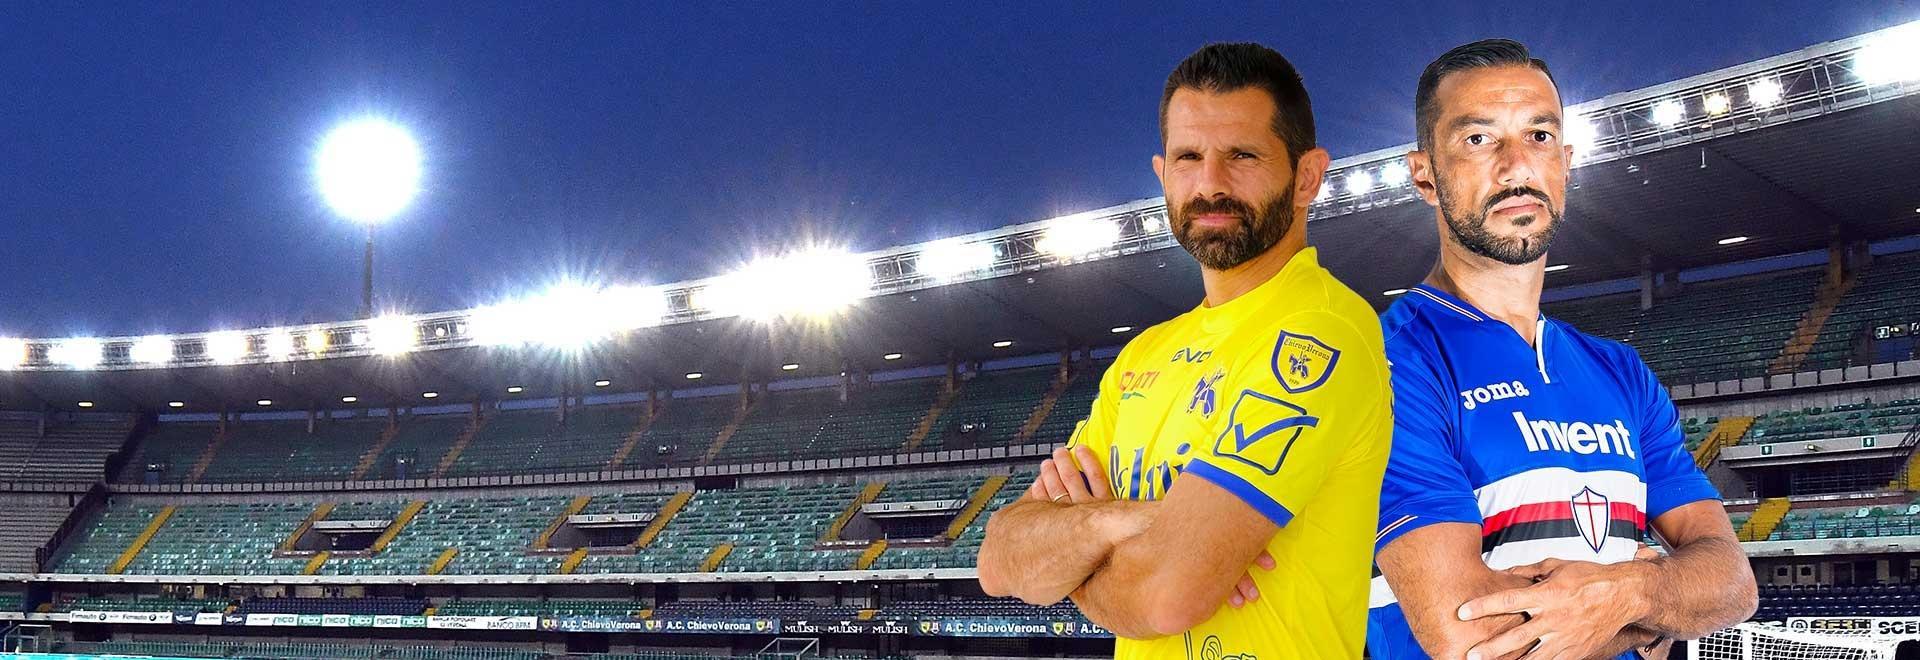 Chievo - Sampdoria. 37a g.